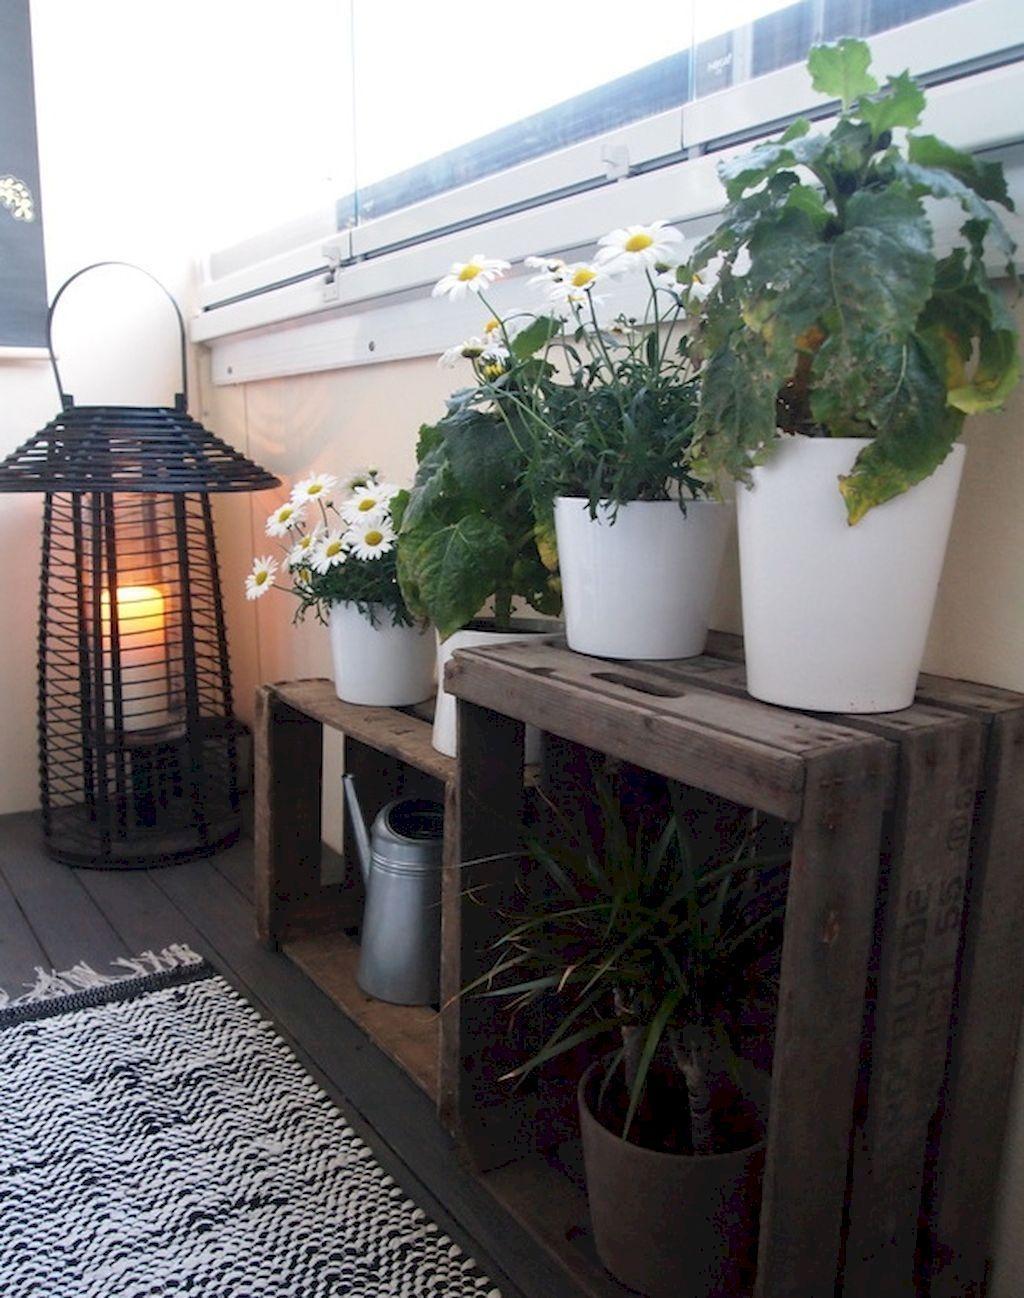 Enchanting Apartment Balcony Decorating Ideas17